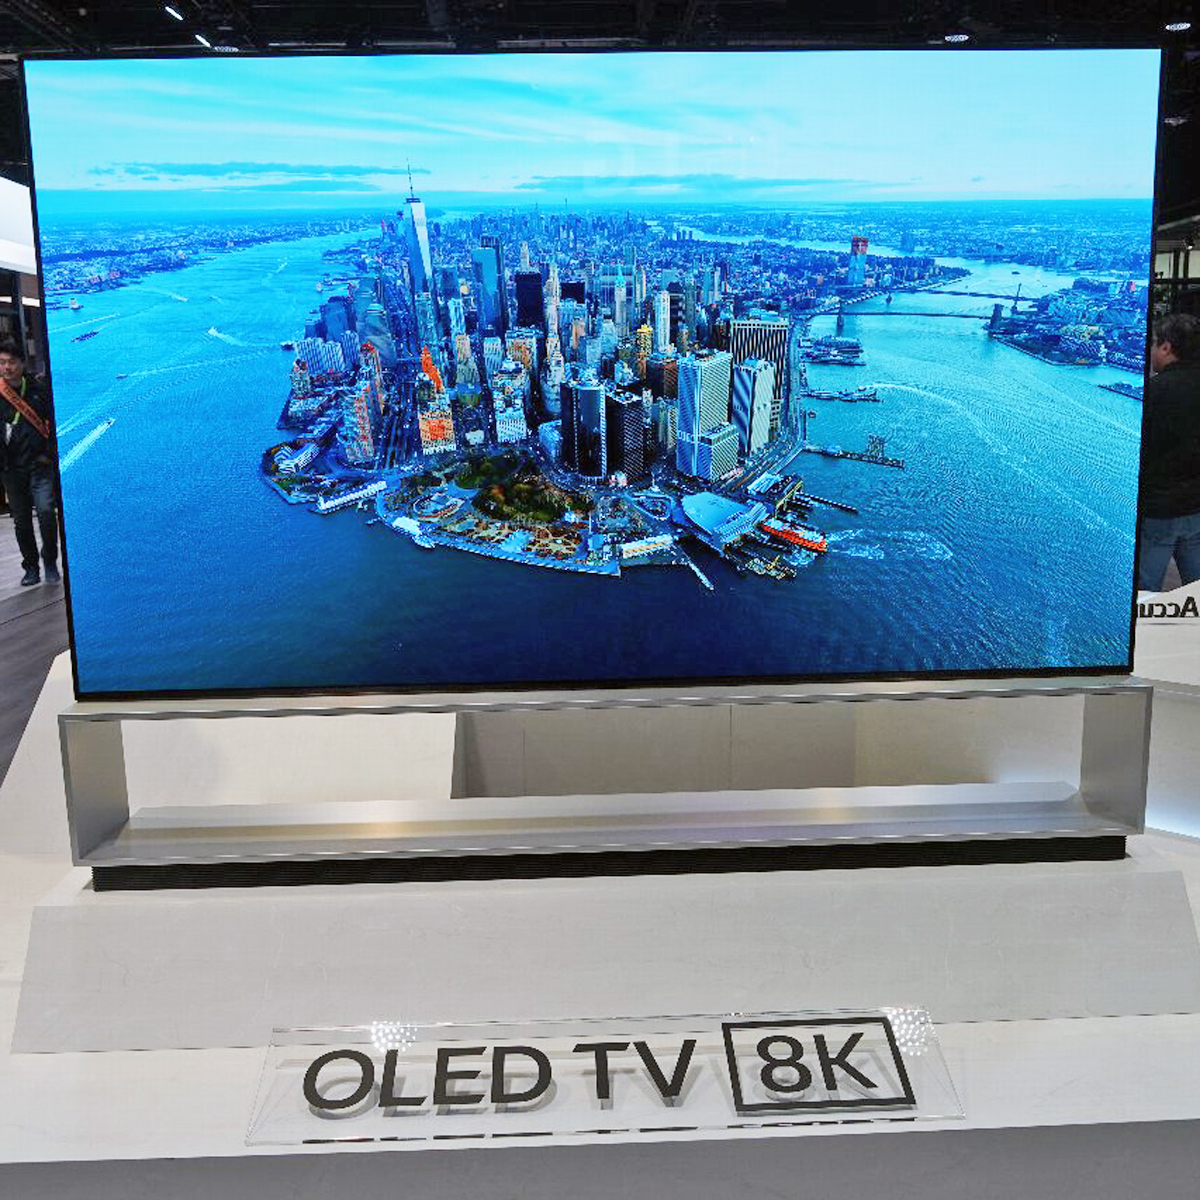 CES 2019会場で見つけた8K、有機ELテレビなど映像関連製品をまとめてチェック!